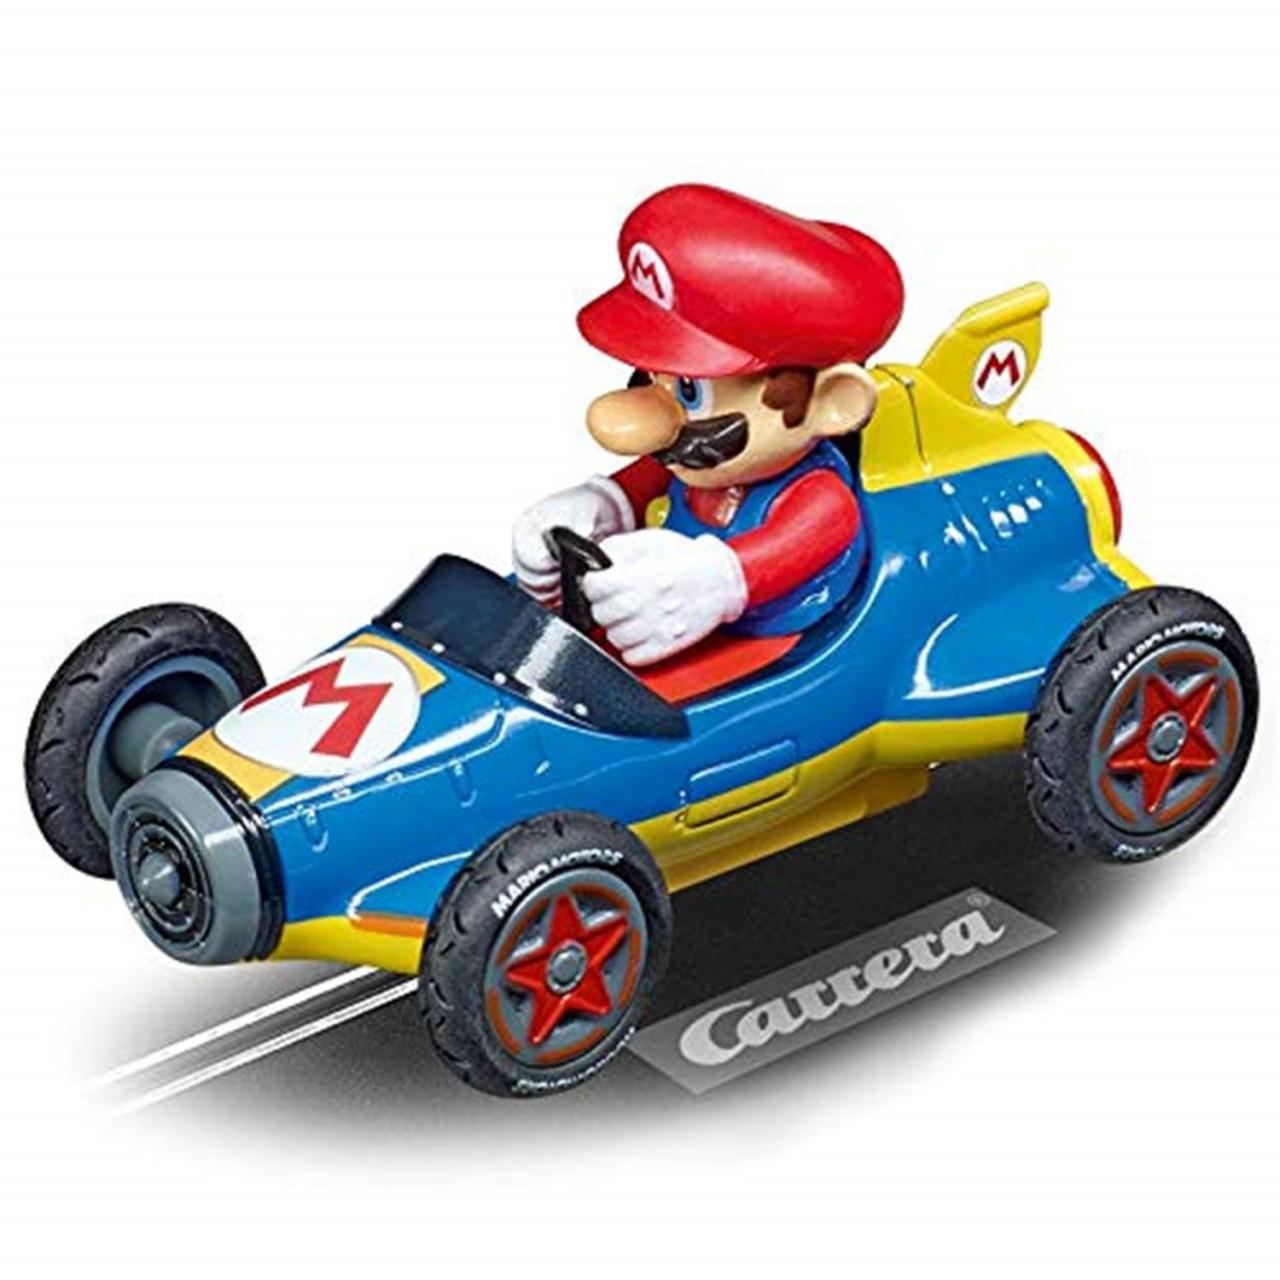 Carrera GO!!! Nintendo Mario Kart-Mach 8 20062492 Autorennbahn 5,3m 2 Autos